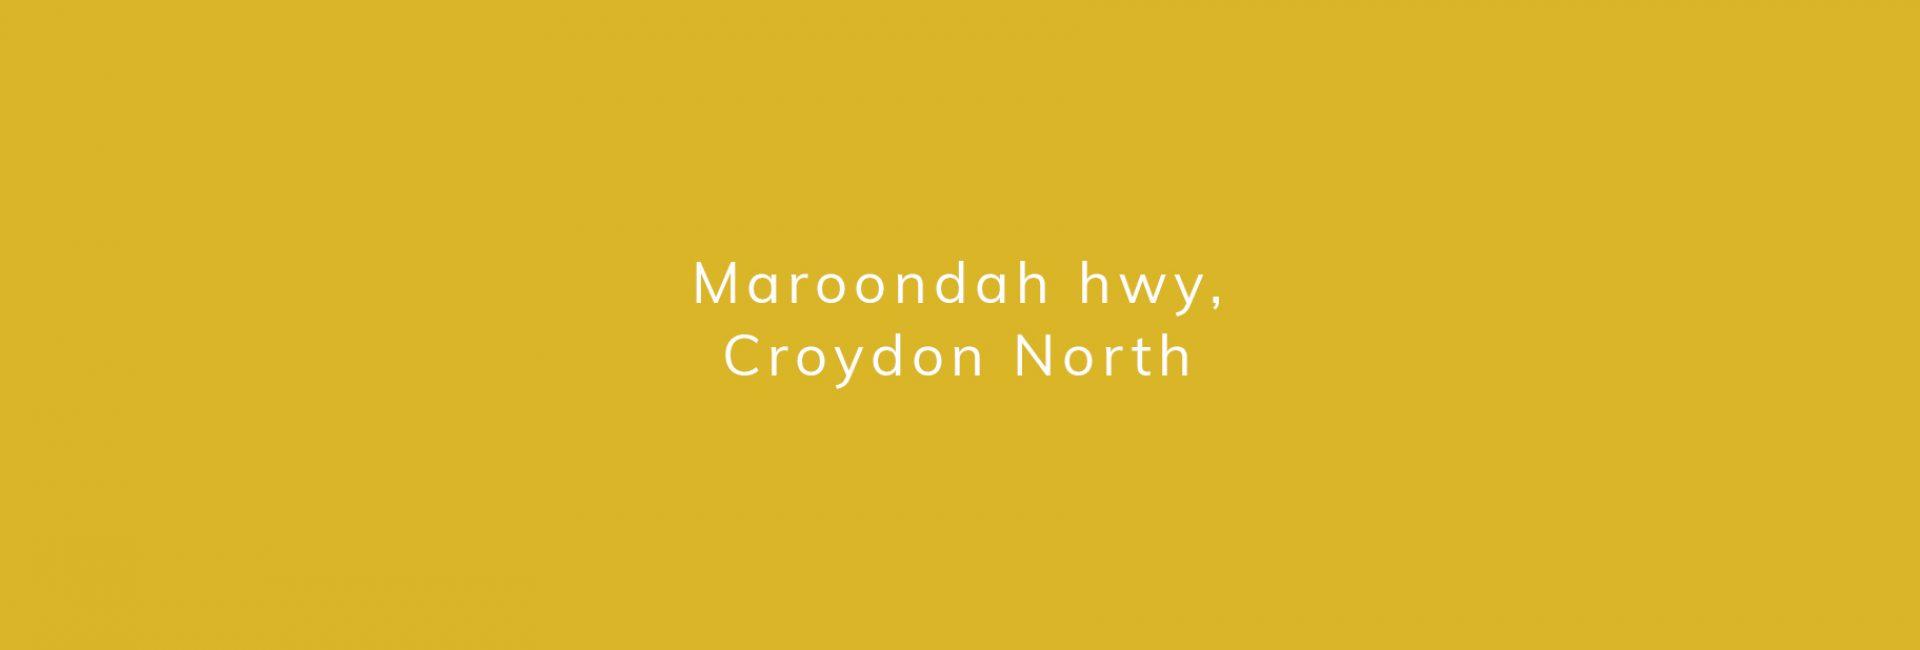 Croydon North